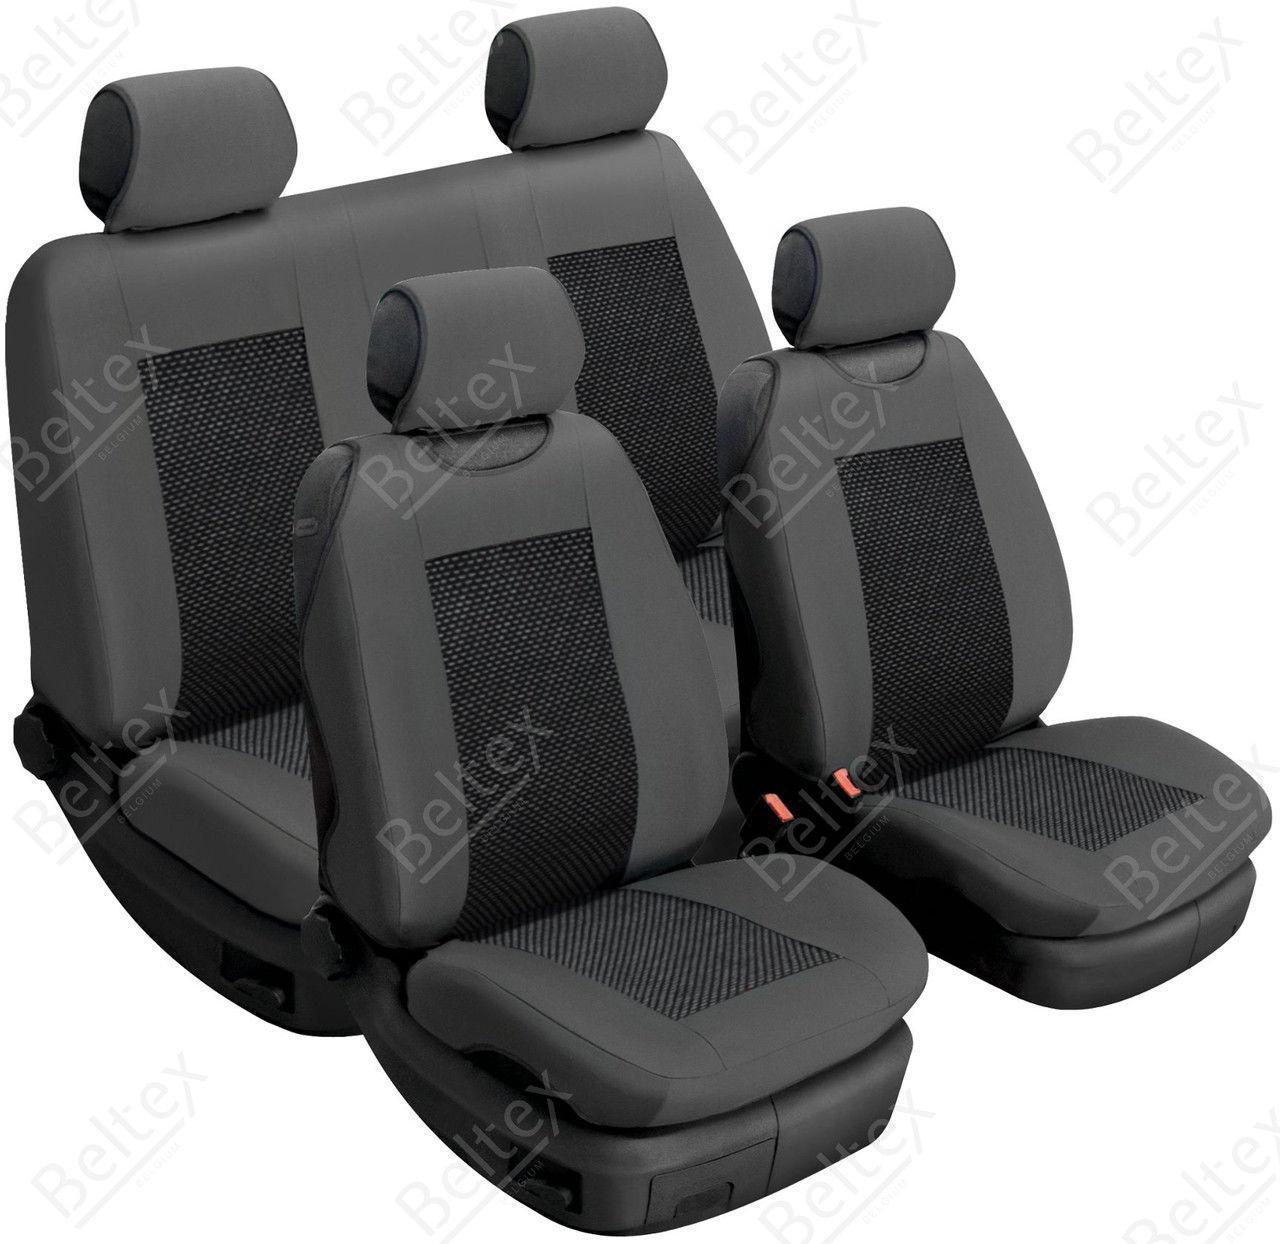 Майки/чехлы на сиденья Опель Зафира Б (Opel Zafira B)